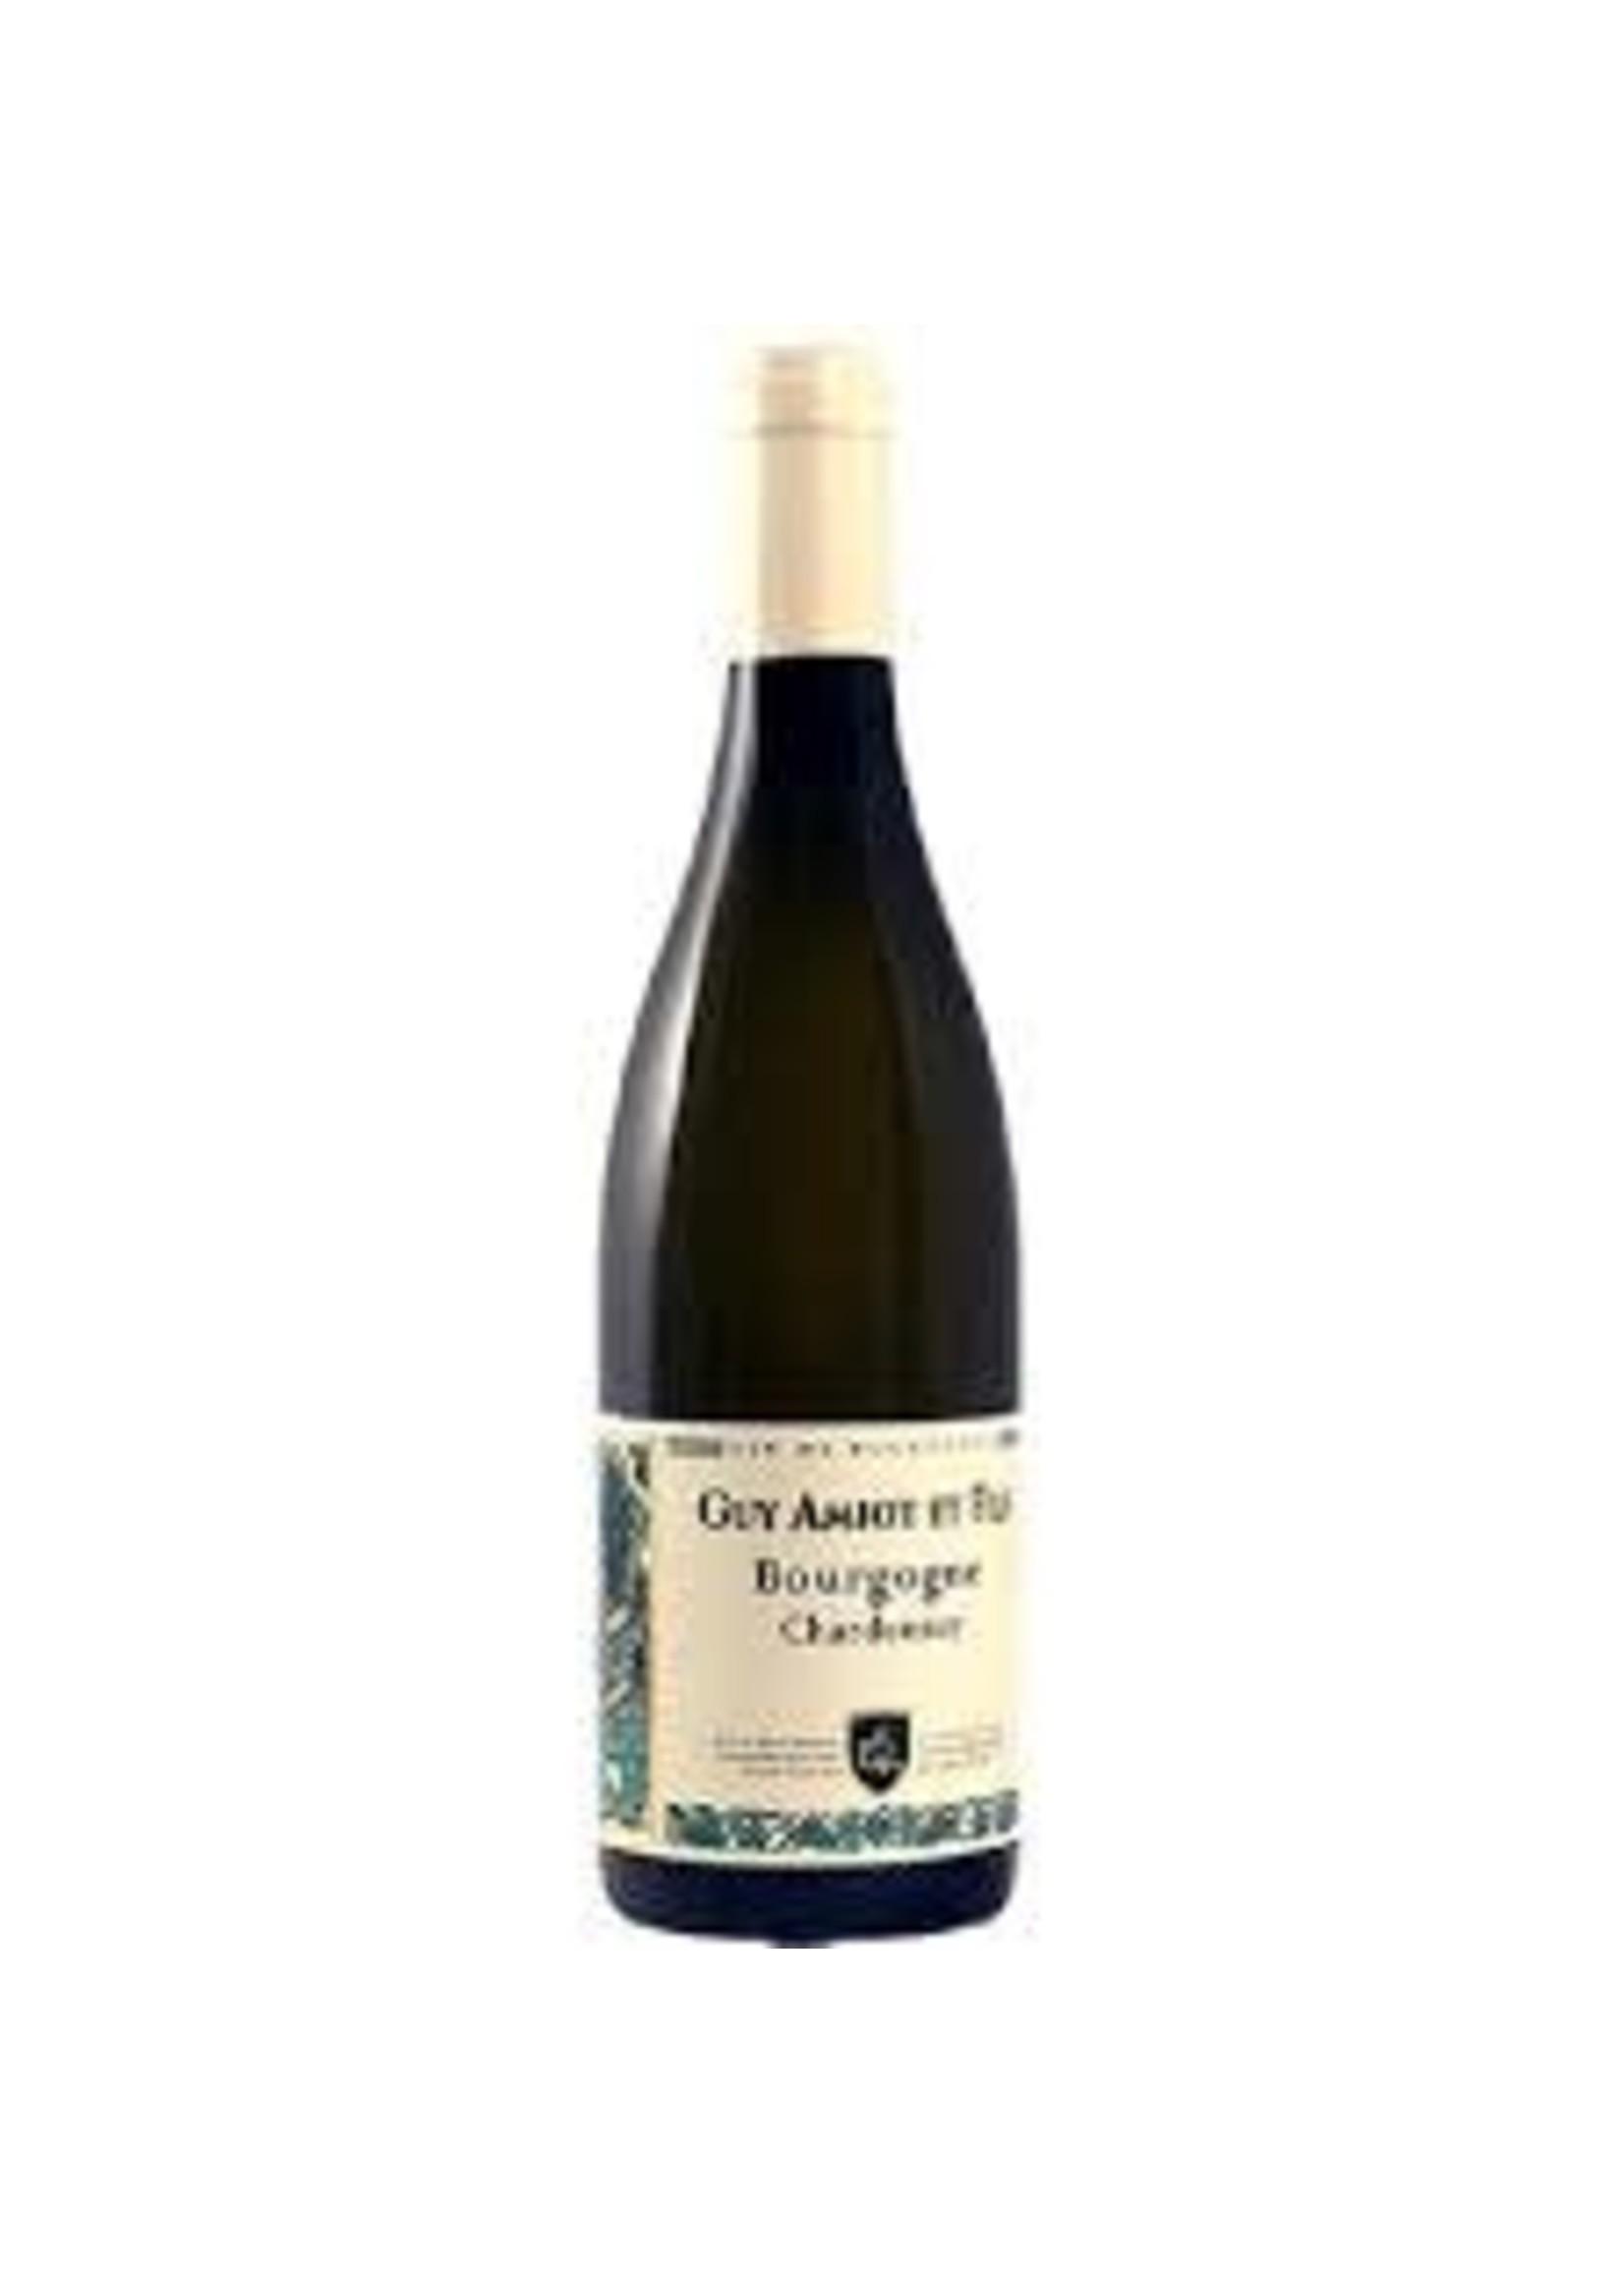 Guy Amiot 2018 Bourgogne Chardonnay 750ml